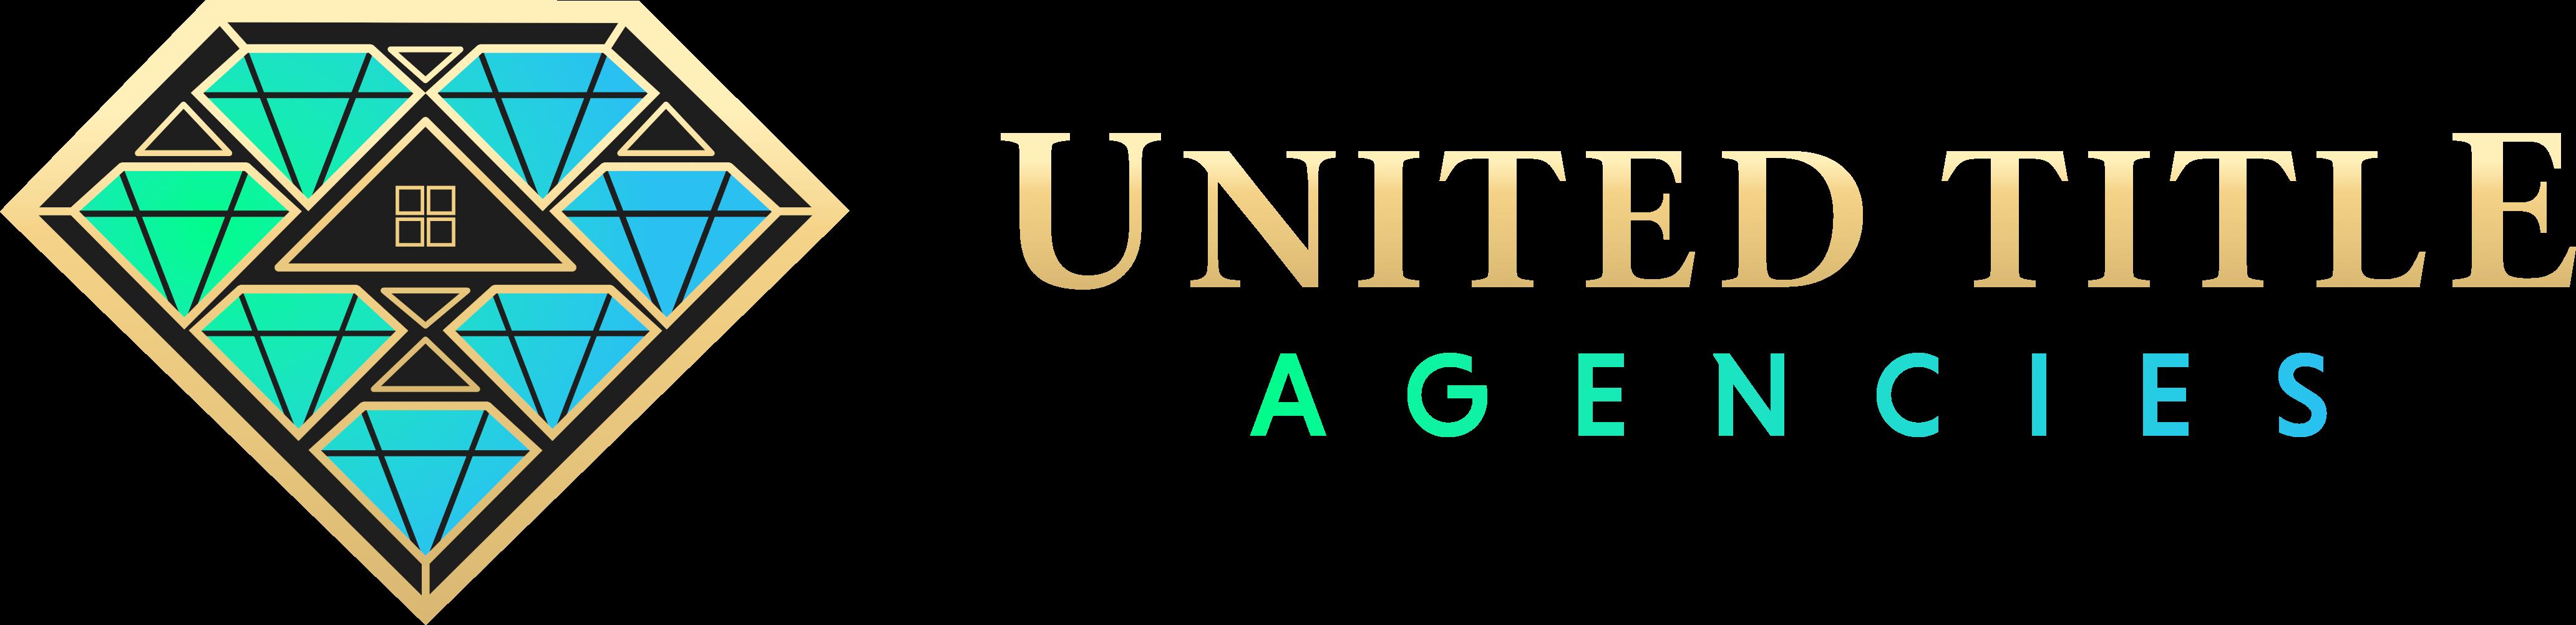 2 HUB Spot UTA New Main Logo Black BG -AI.png